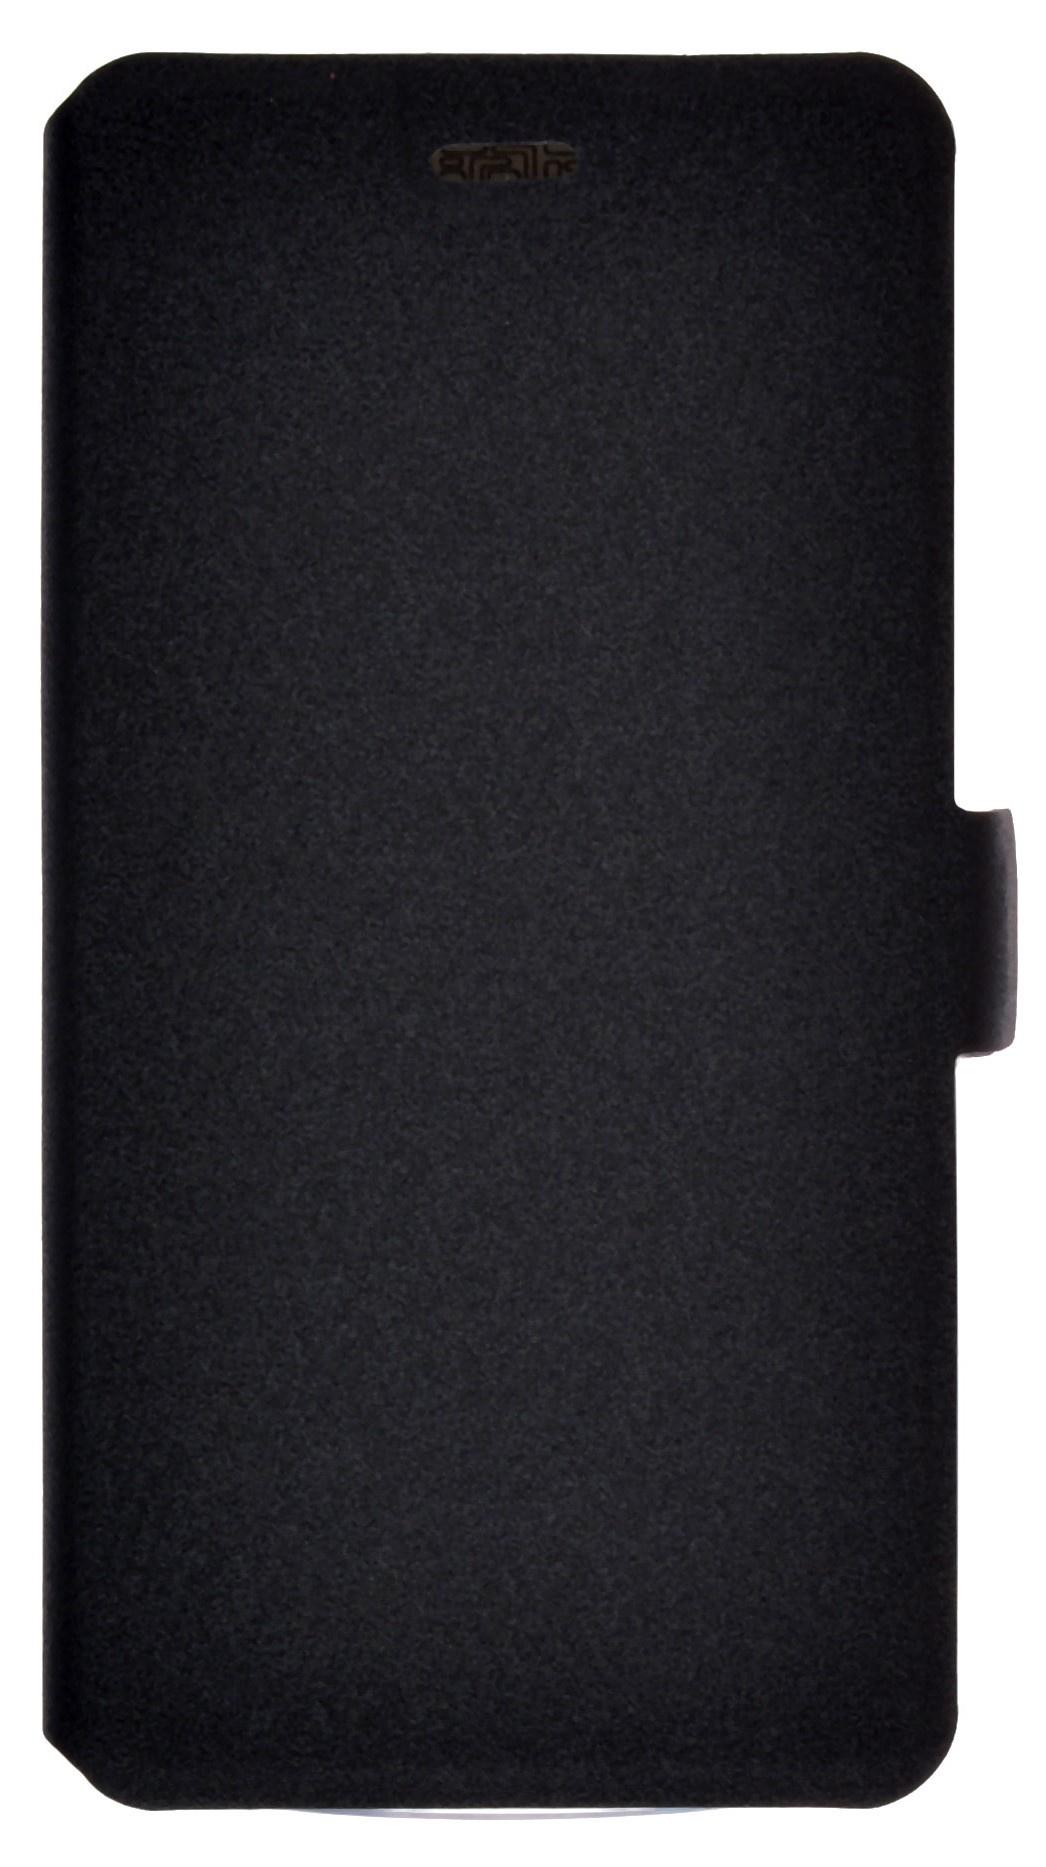 Чехол Prime Book для Prestigio Wize G3, 2000000157283, черный аккумулятор для телефона ibatt bl 53yh для lg d855 g3 d690 d690 g3 stylus d851 g3 d850 g3 d856 lg g3 dual lte vs985 g3 ls990 g3 d690n f400 g3 aka